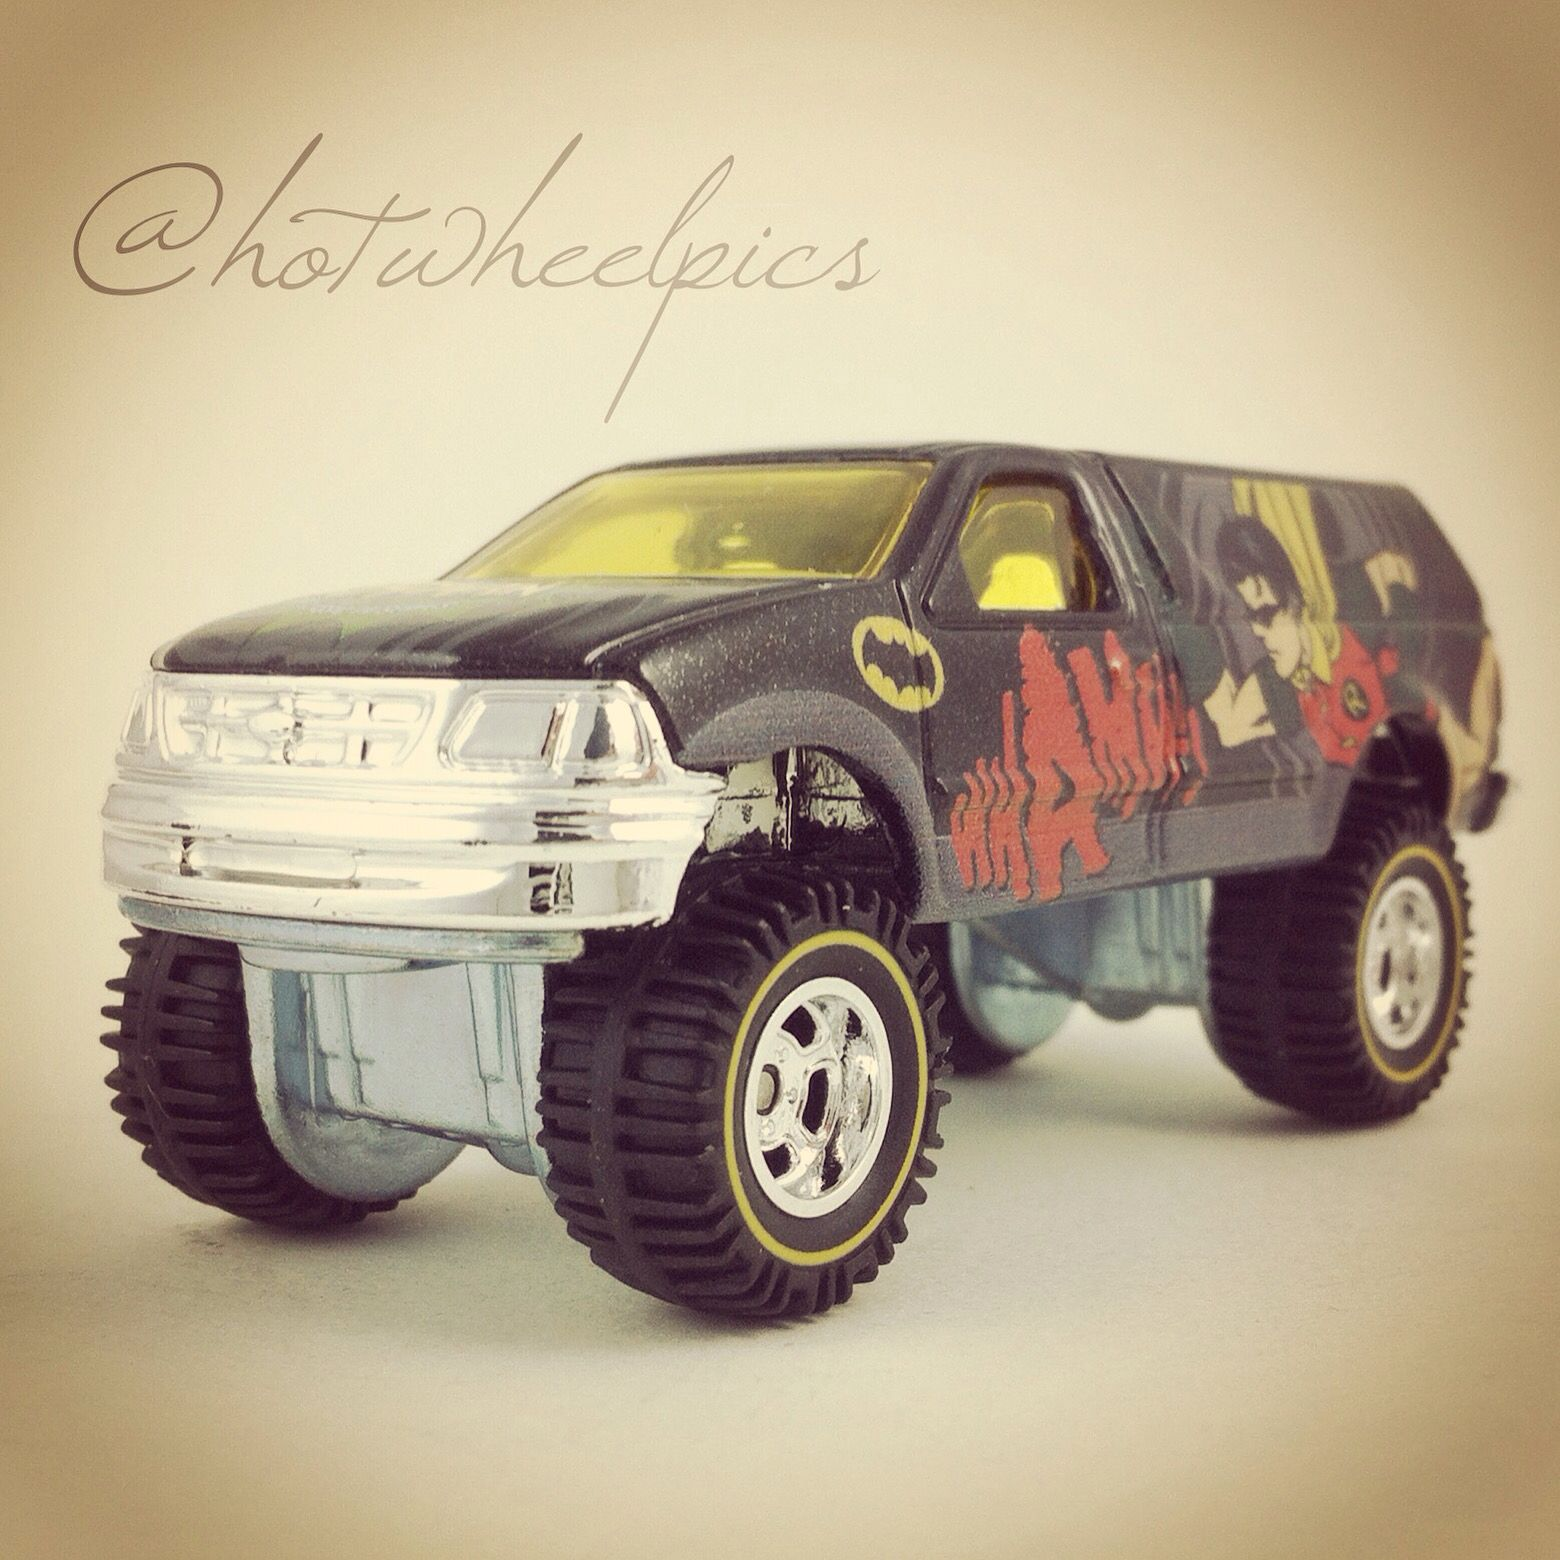 'Robin' Ford F-150 - 2015 Hot Wheels - Batman Pop Culture Series #hotwheels   #diecast   #toys   #Ford   #hwp2015pcbat